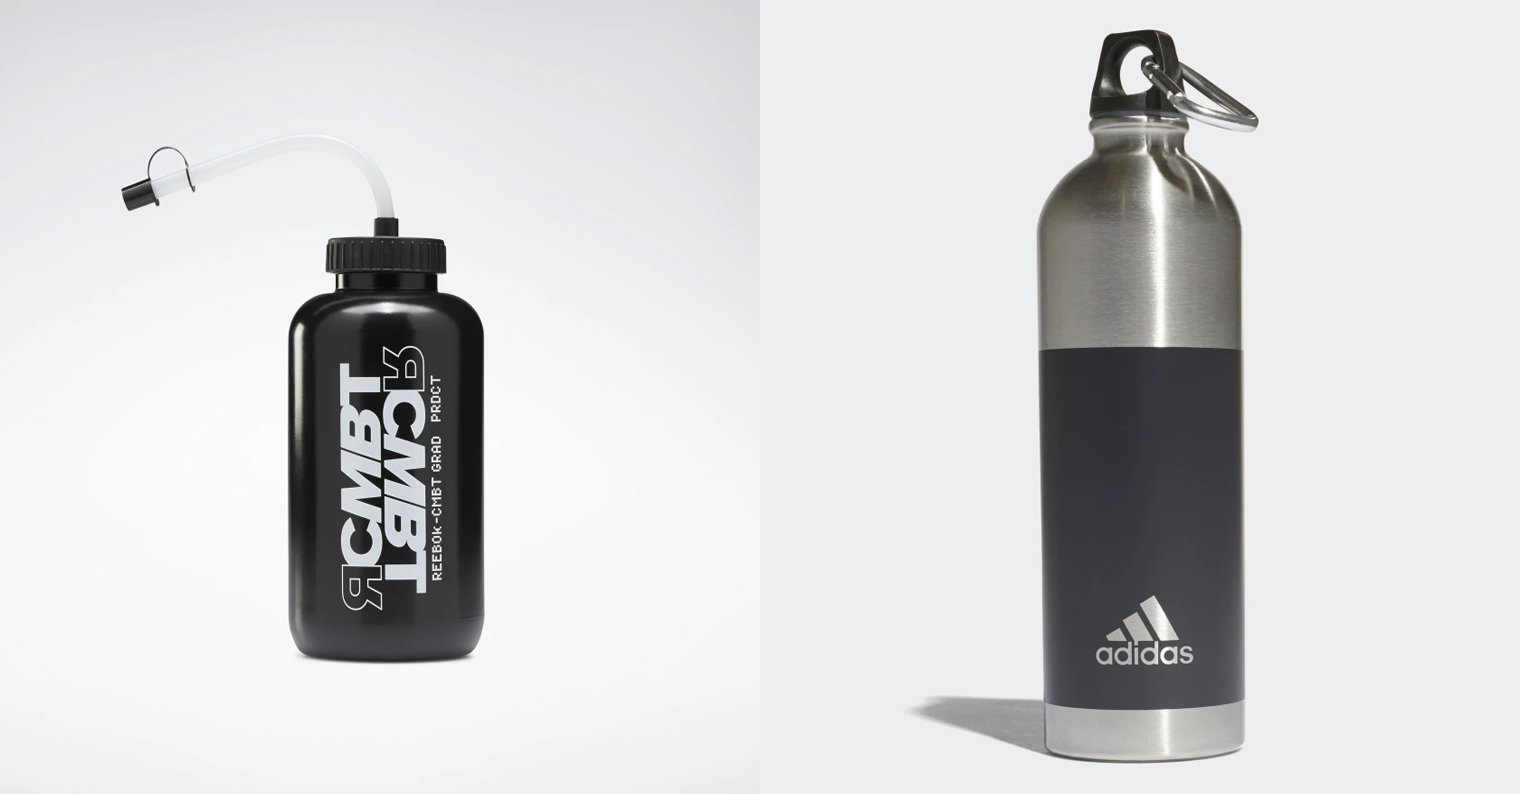 Многоразовые бутылки adidas и reebok